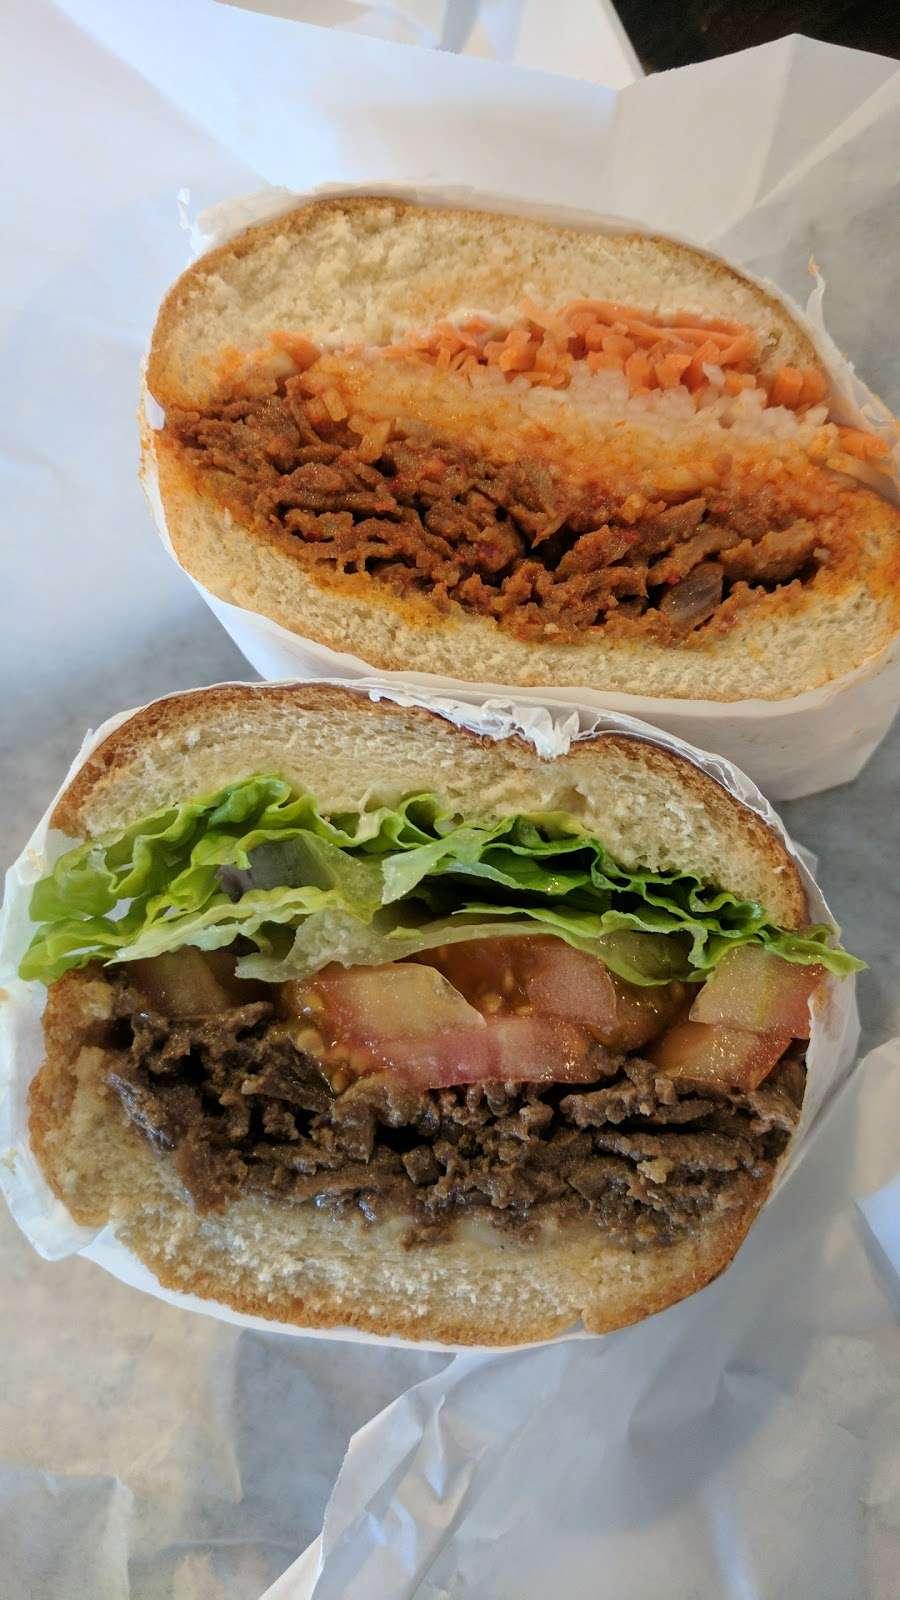 Cafe Sis - restaurant  | Photo 6 of 10 | Address: 402 Balboa St, San Francisco, CA 94118, USA